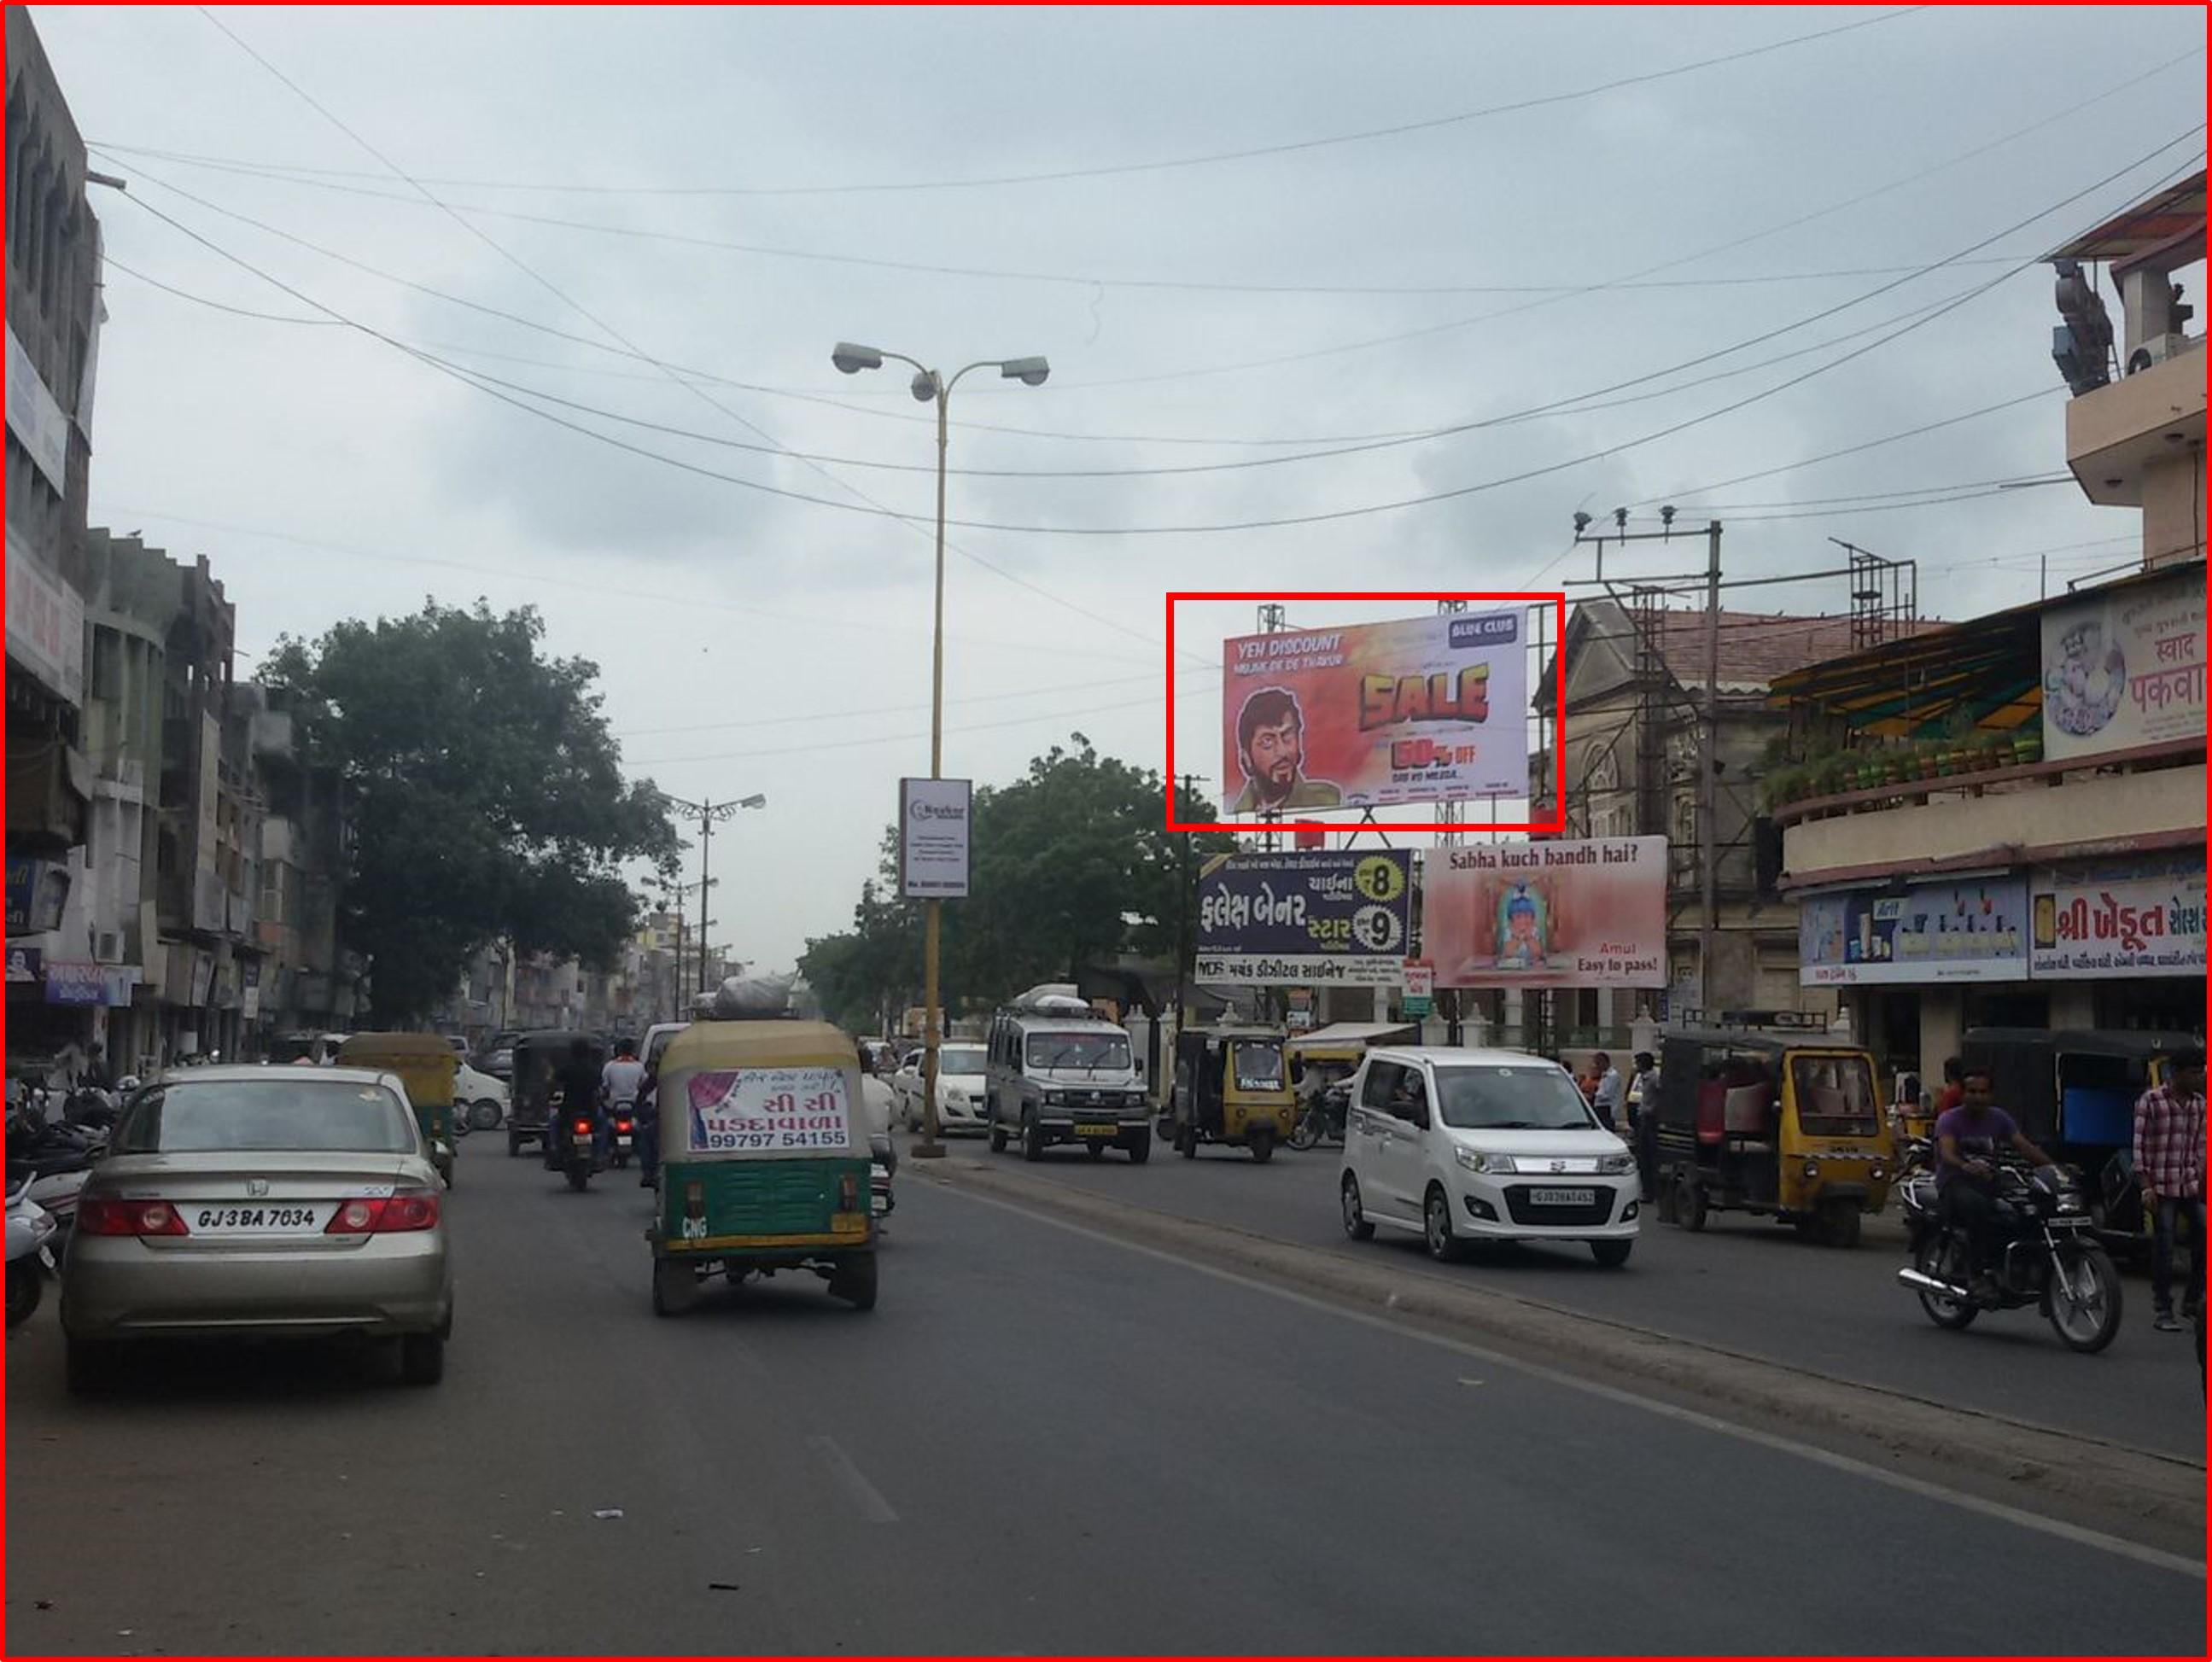 Dhebar Road, Bhitkhana Chowk, Near Bus Stand, Rajkot